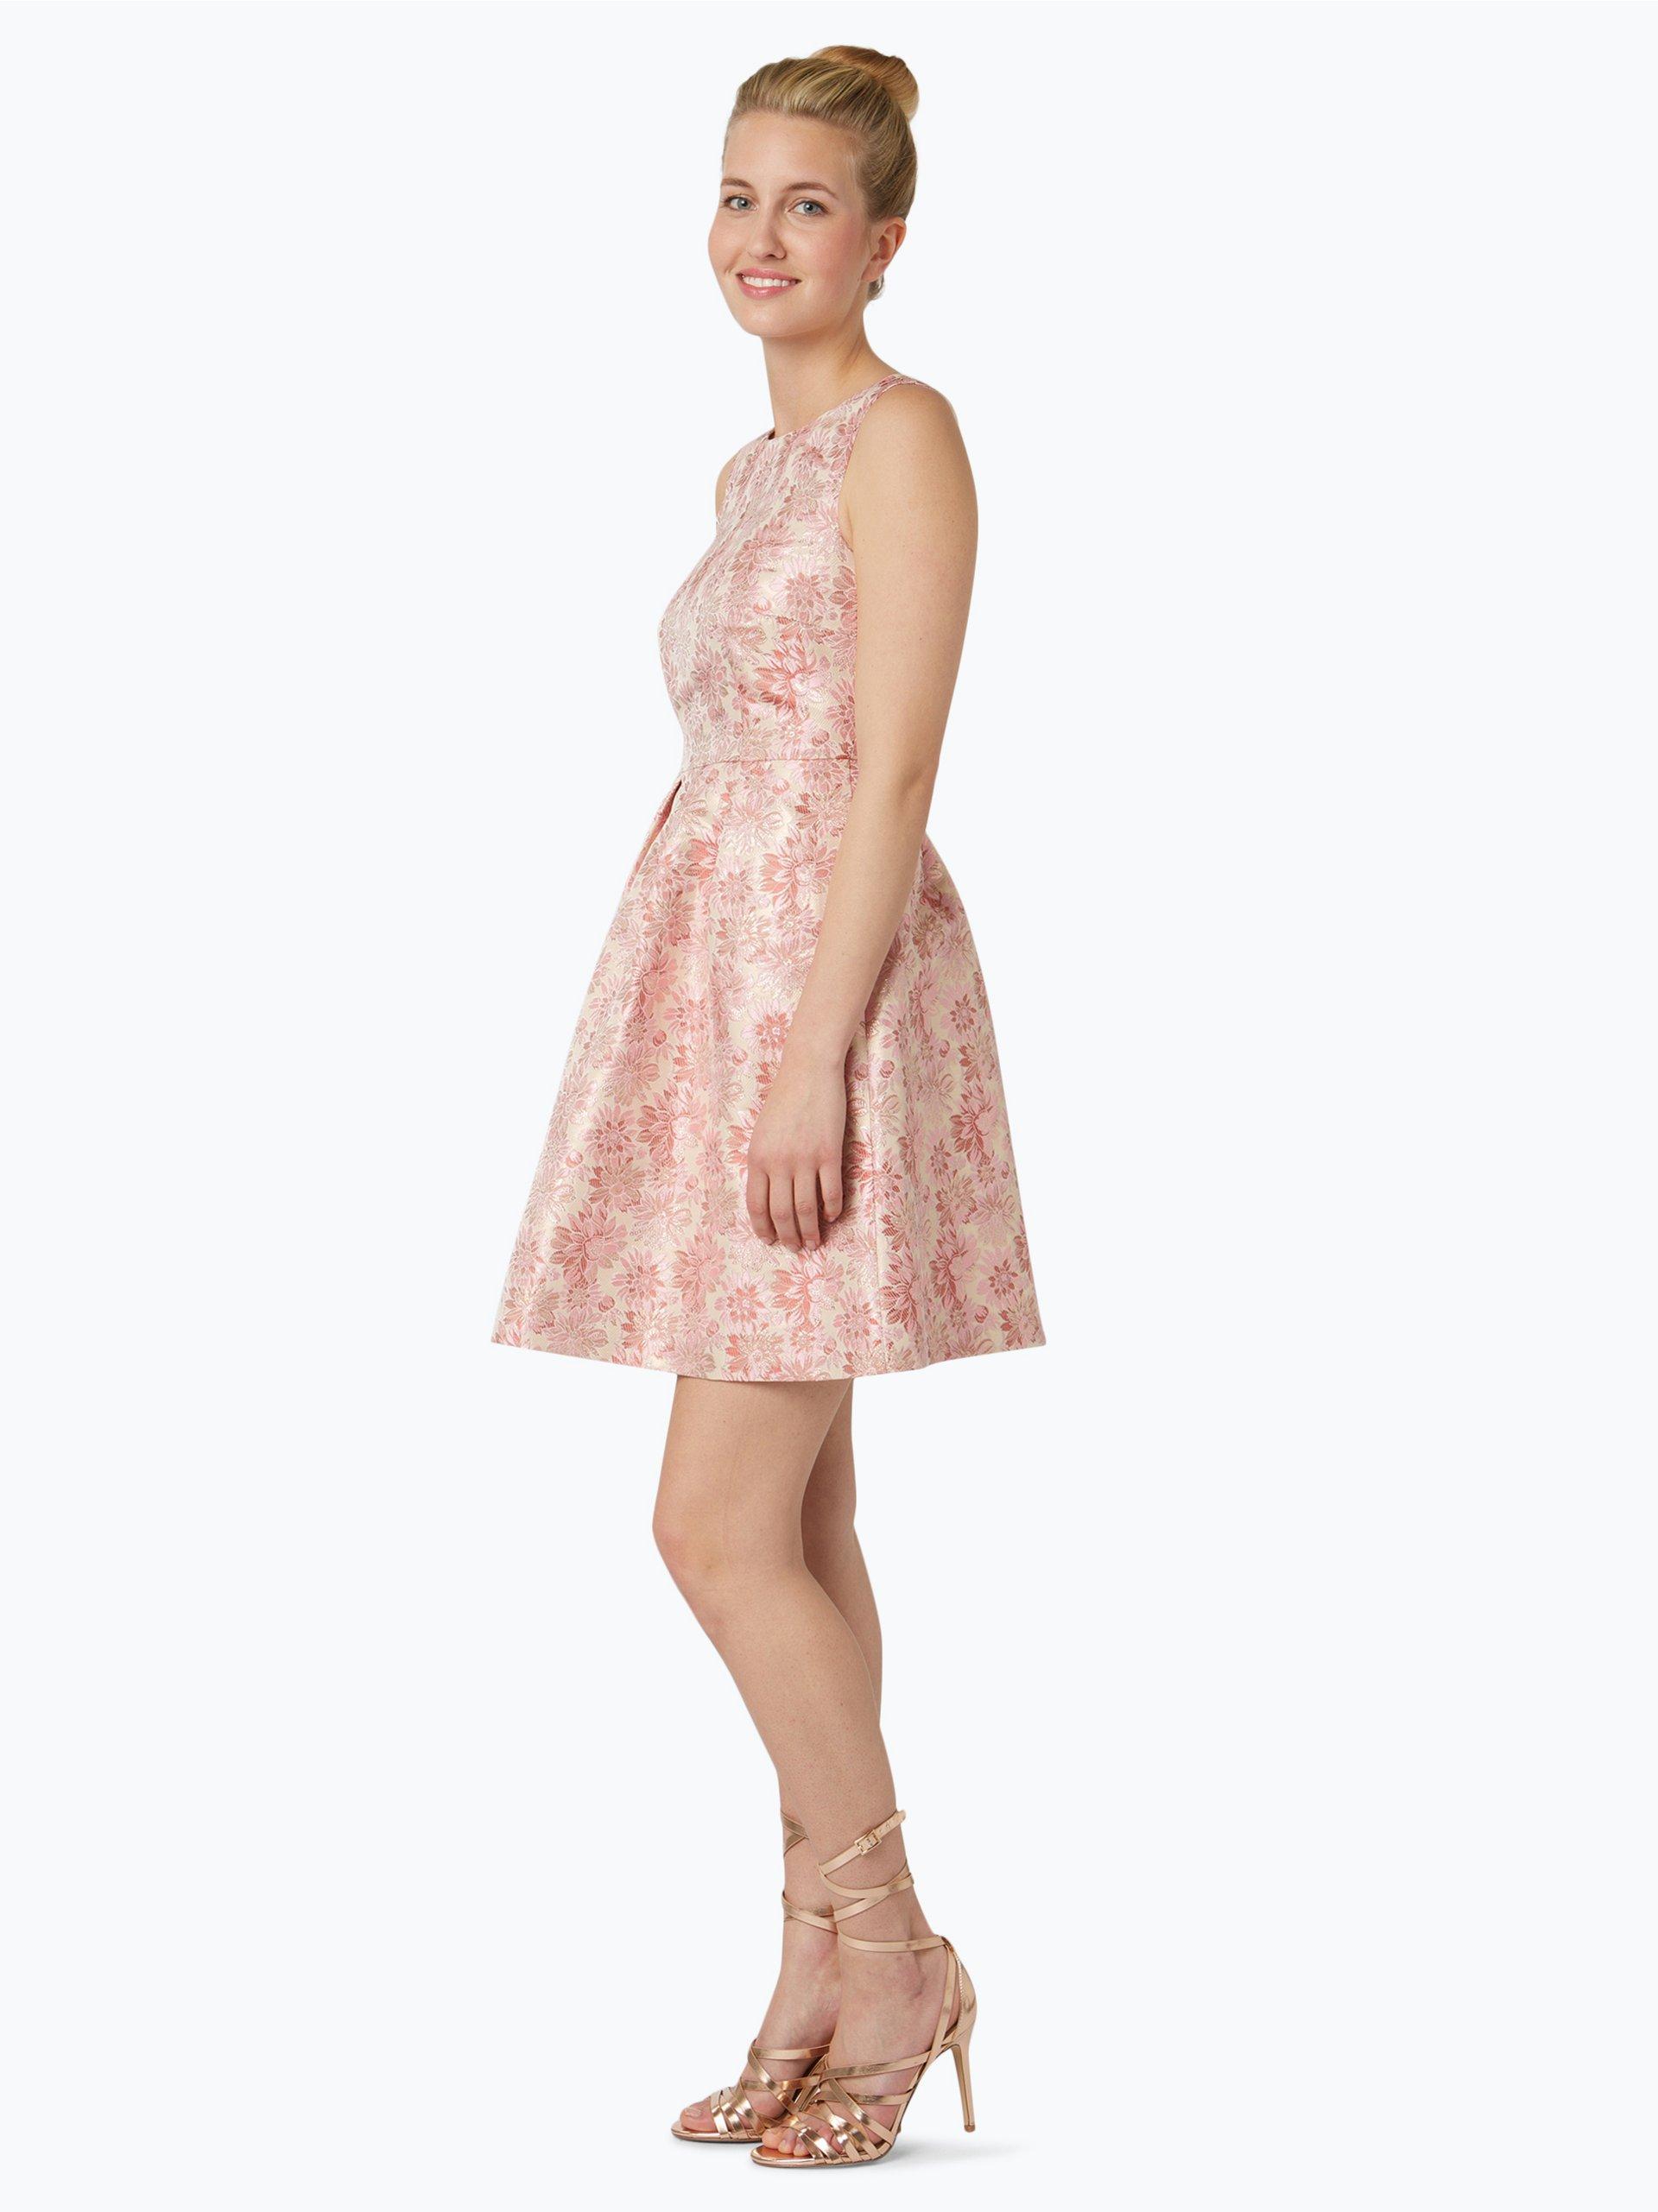 marie lund damen cocktailkleid rosa gemustert online. Black Bedroom Furniture Sets. Home Design Ideas